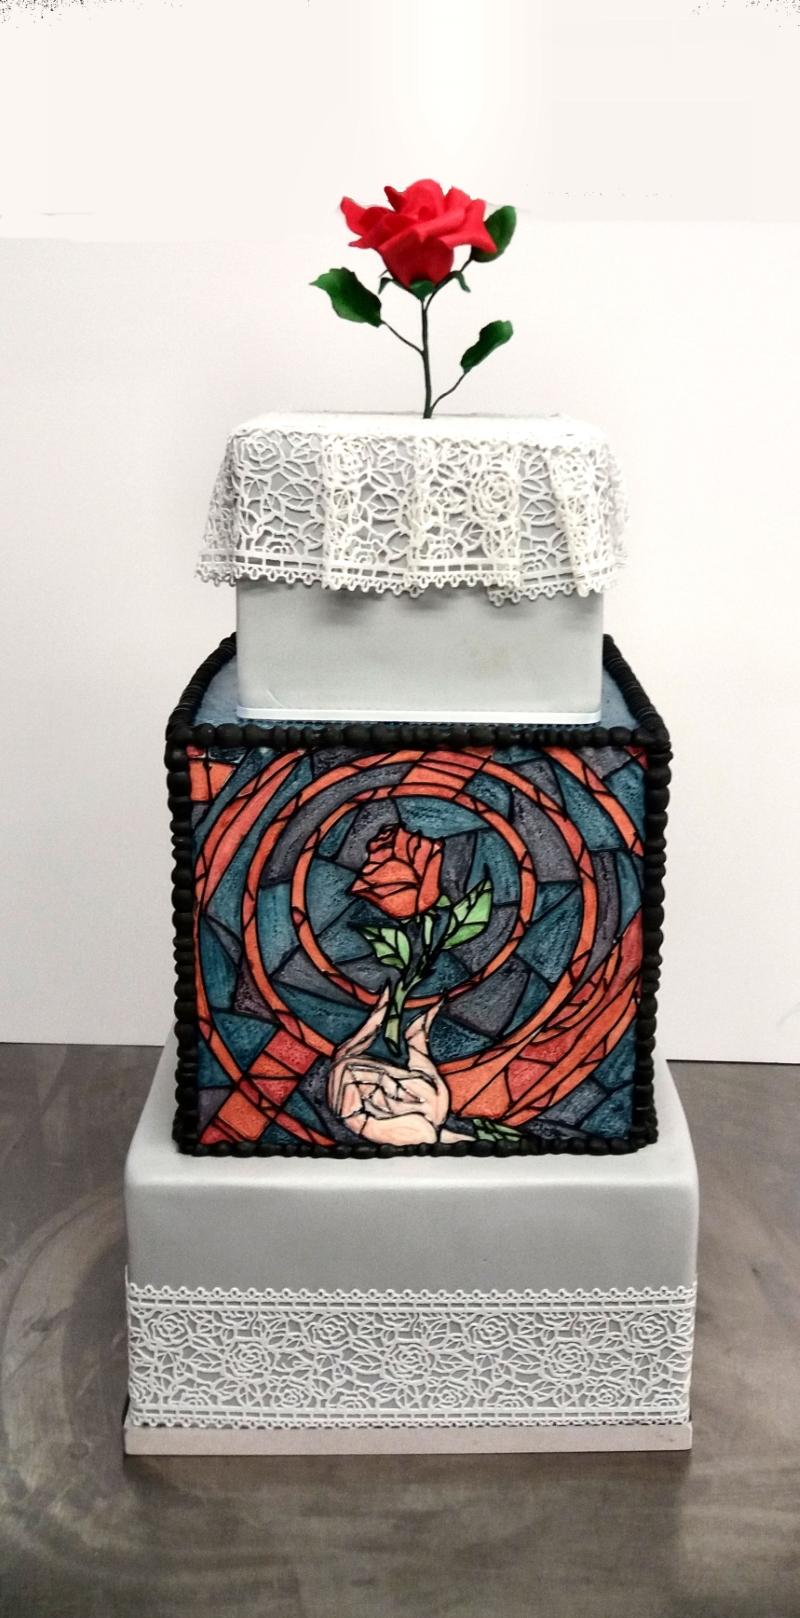 Stain Glass Beauty & The Beast Wedding Cake